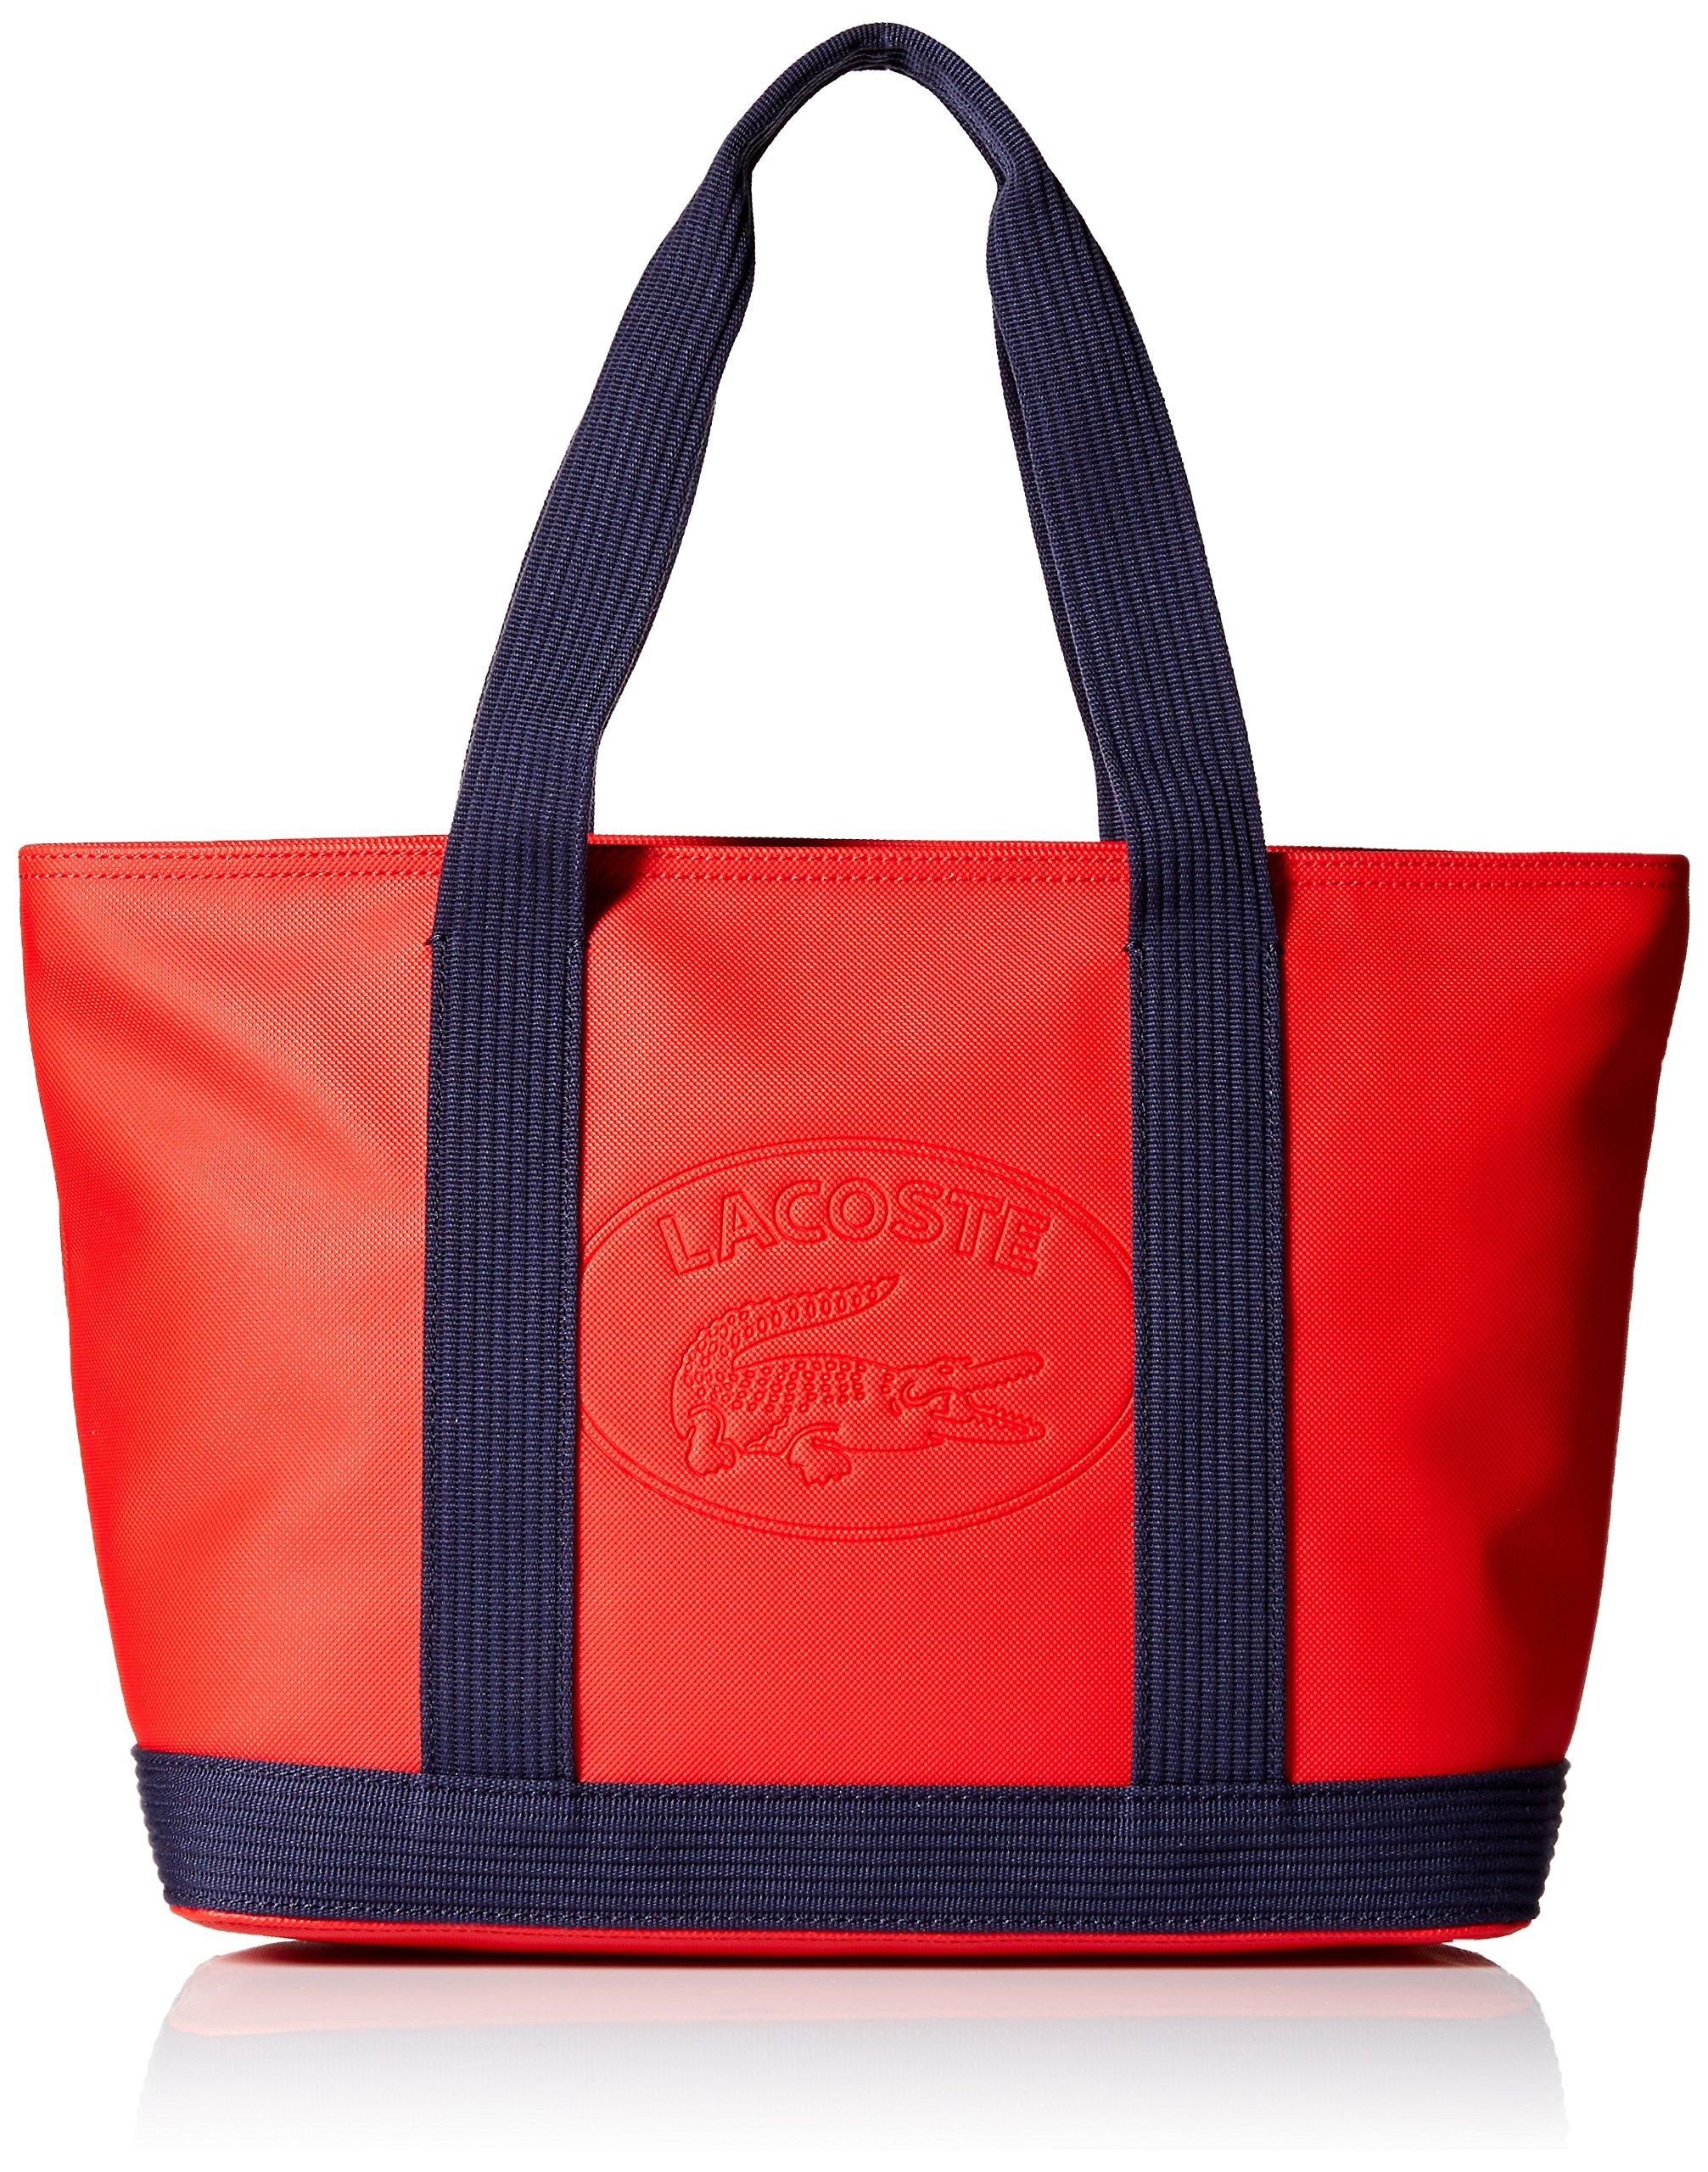 Lacoste Medium Shopping Bag, Nf2416wm, High Risk Red Peacoat